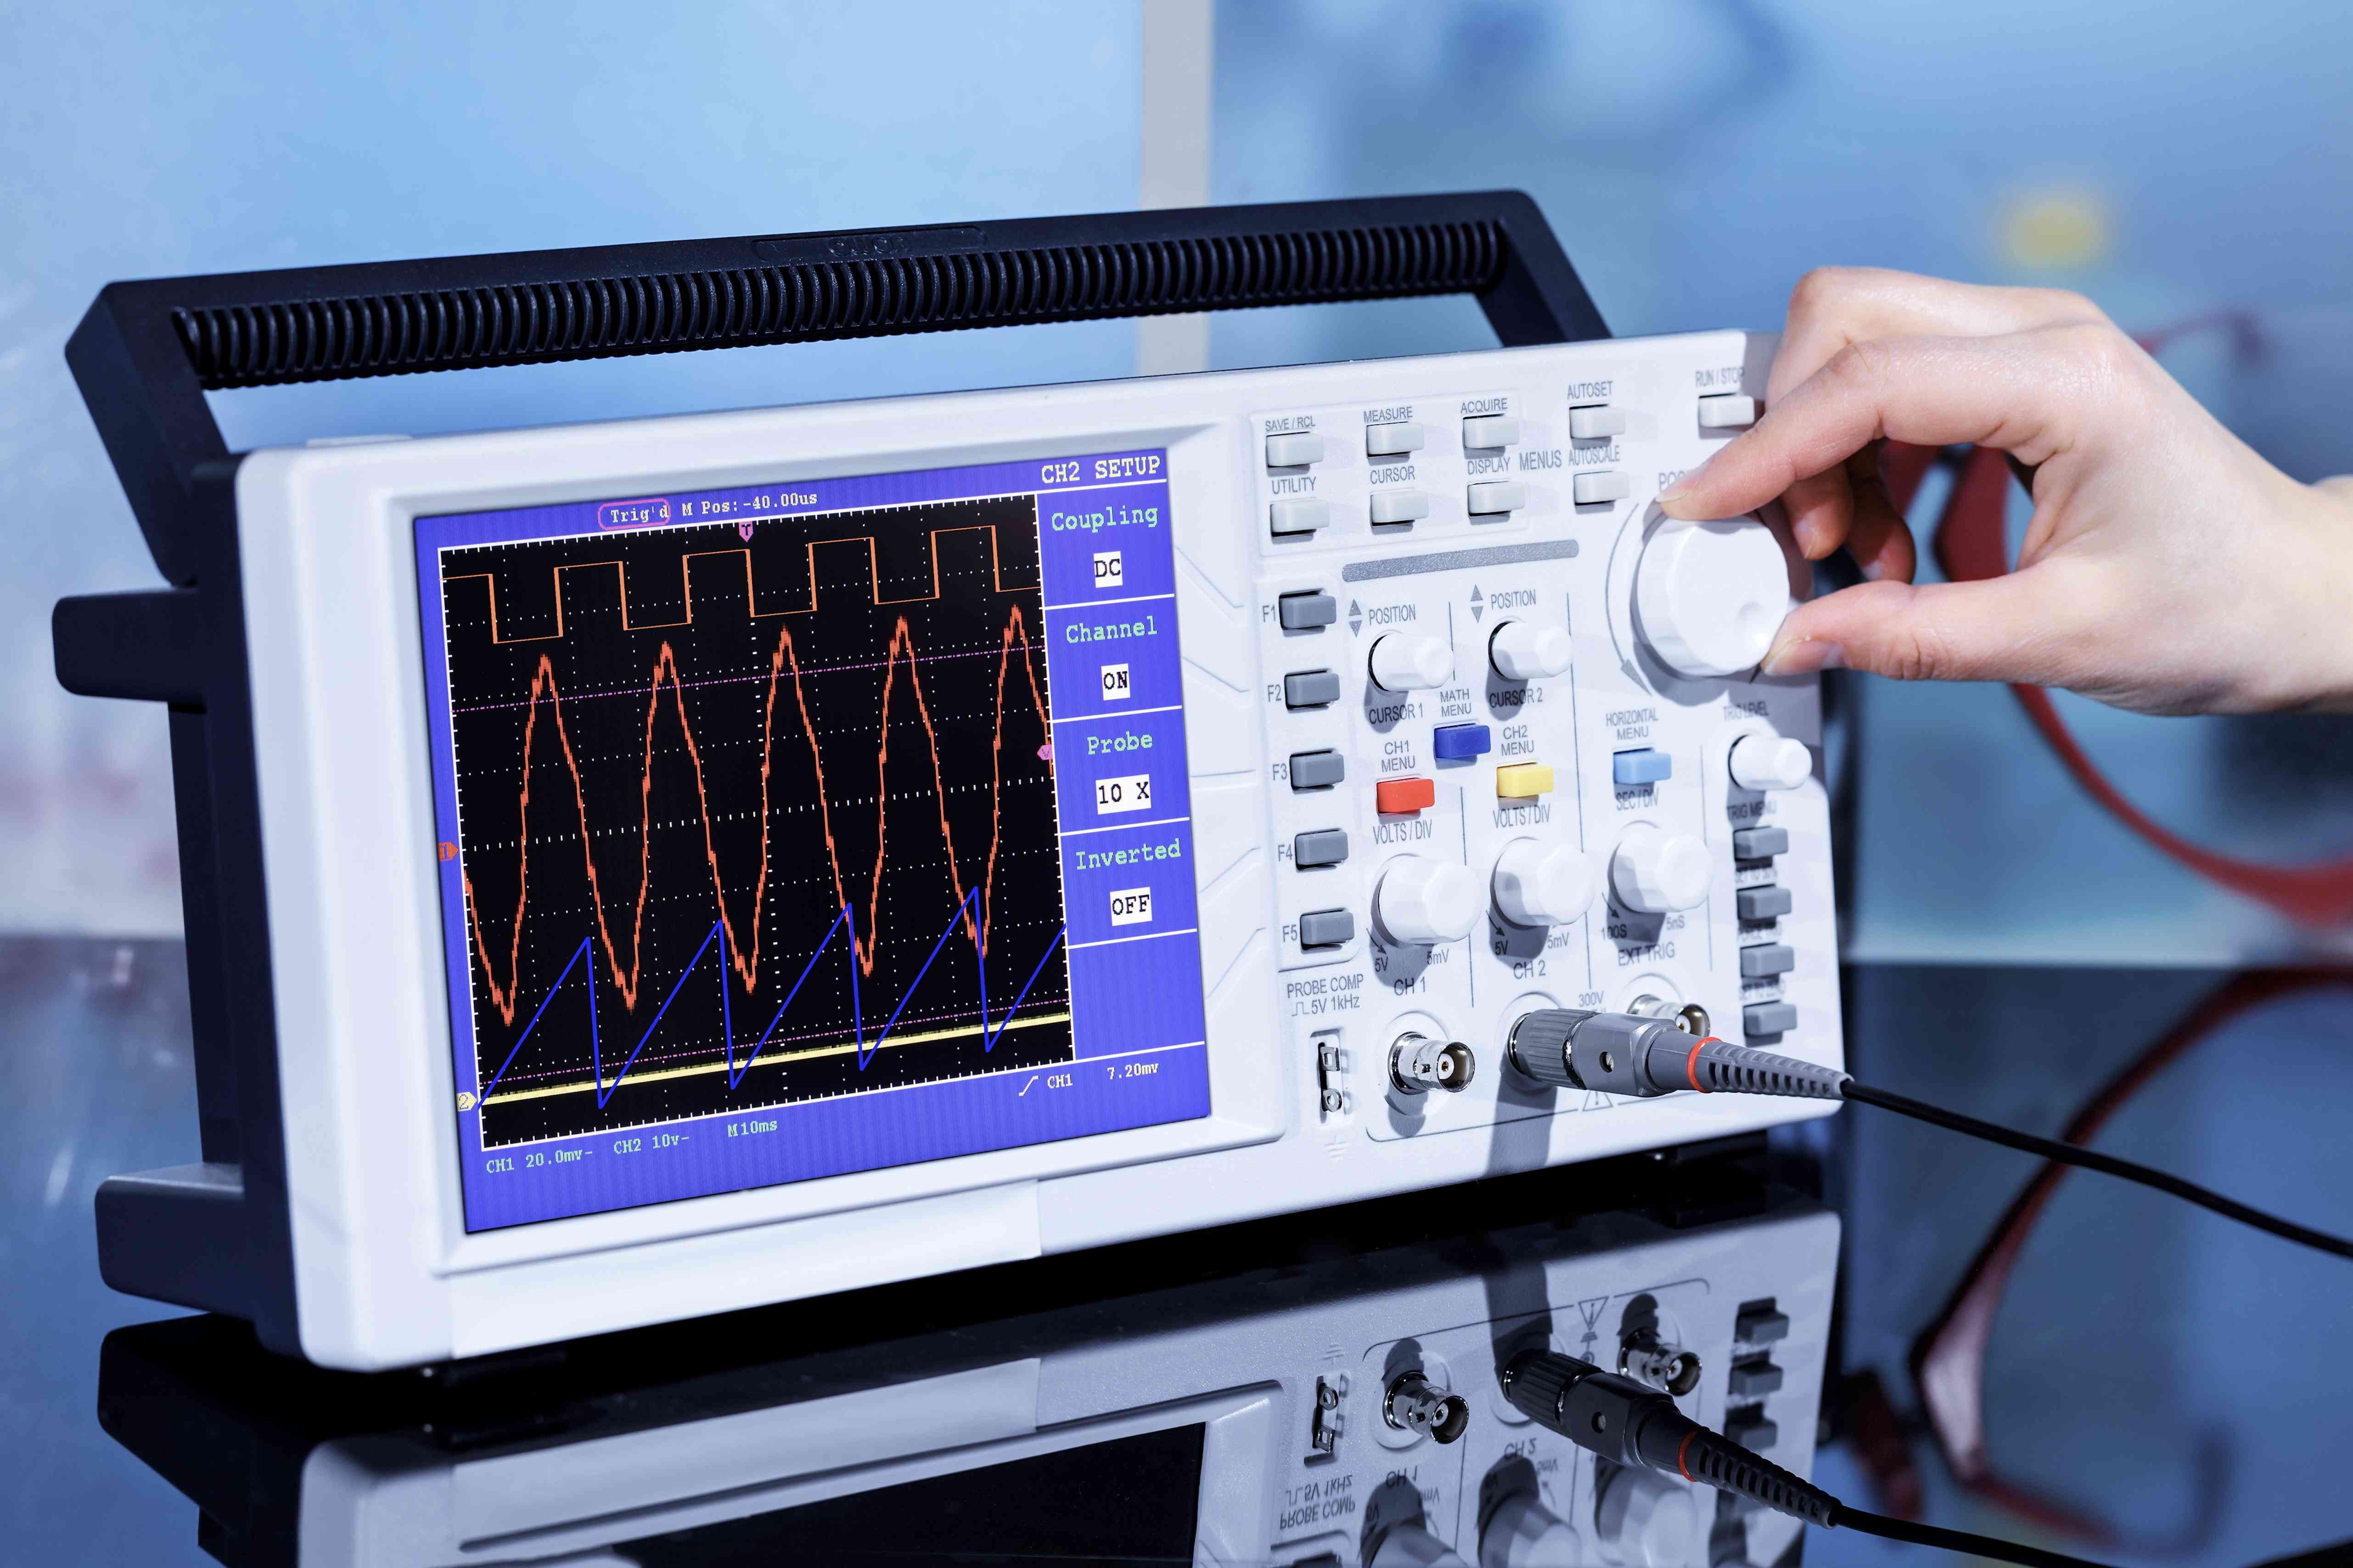 Hand adjusting dial on oscilloscope